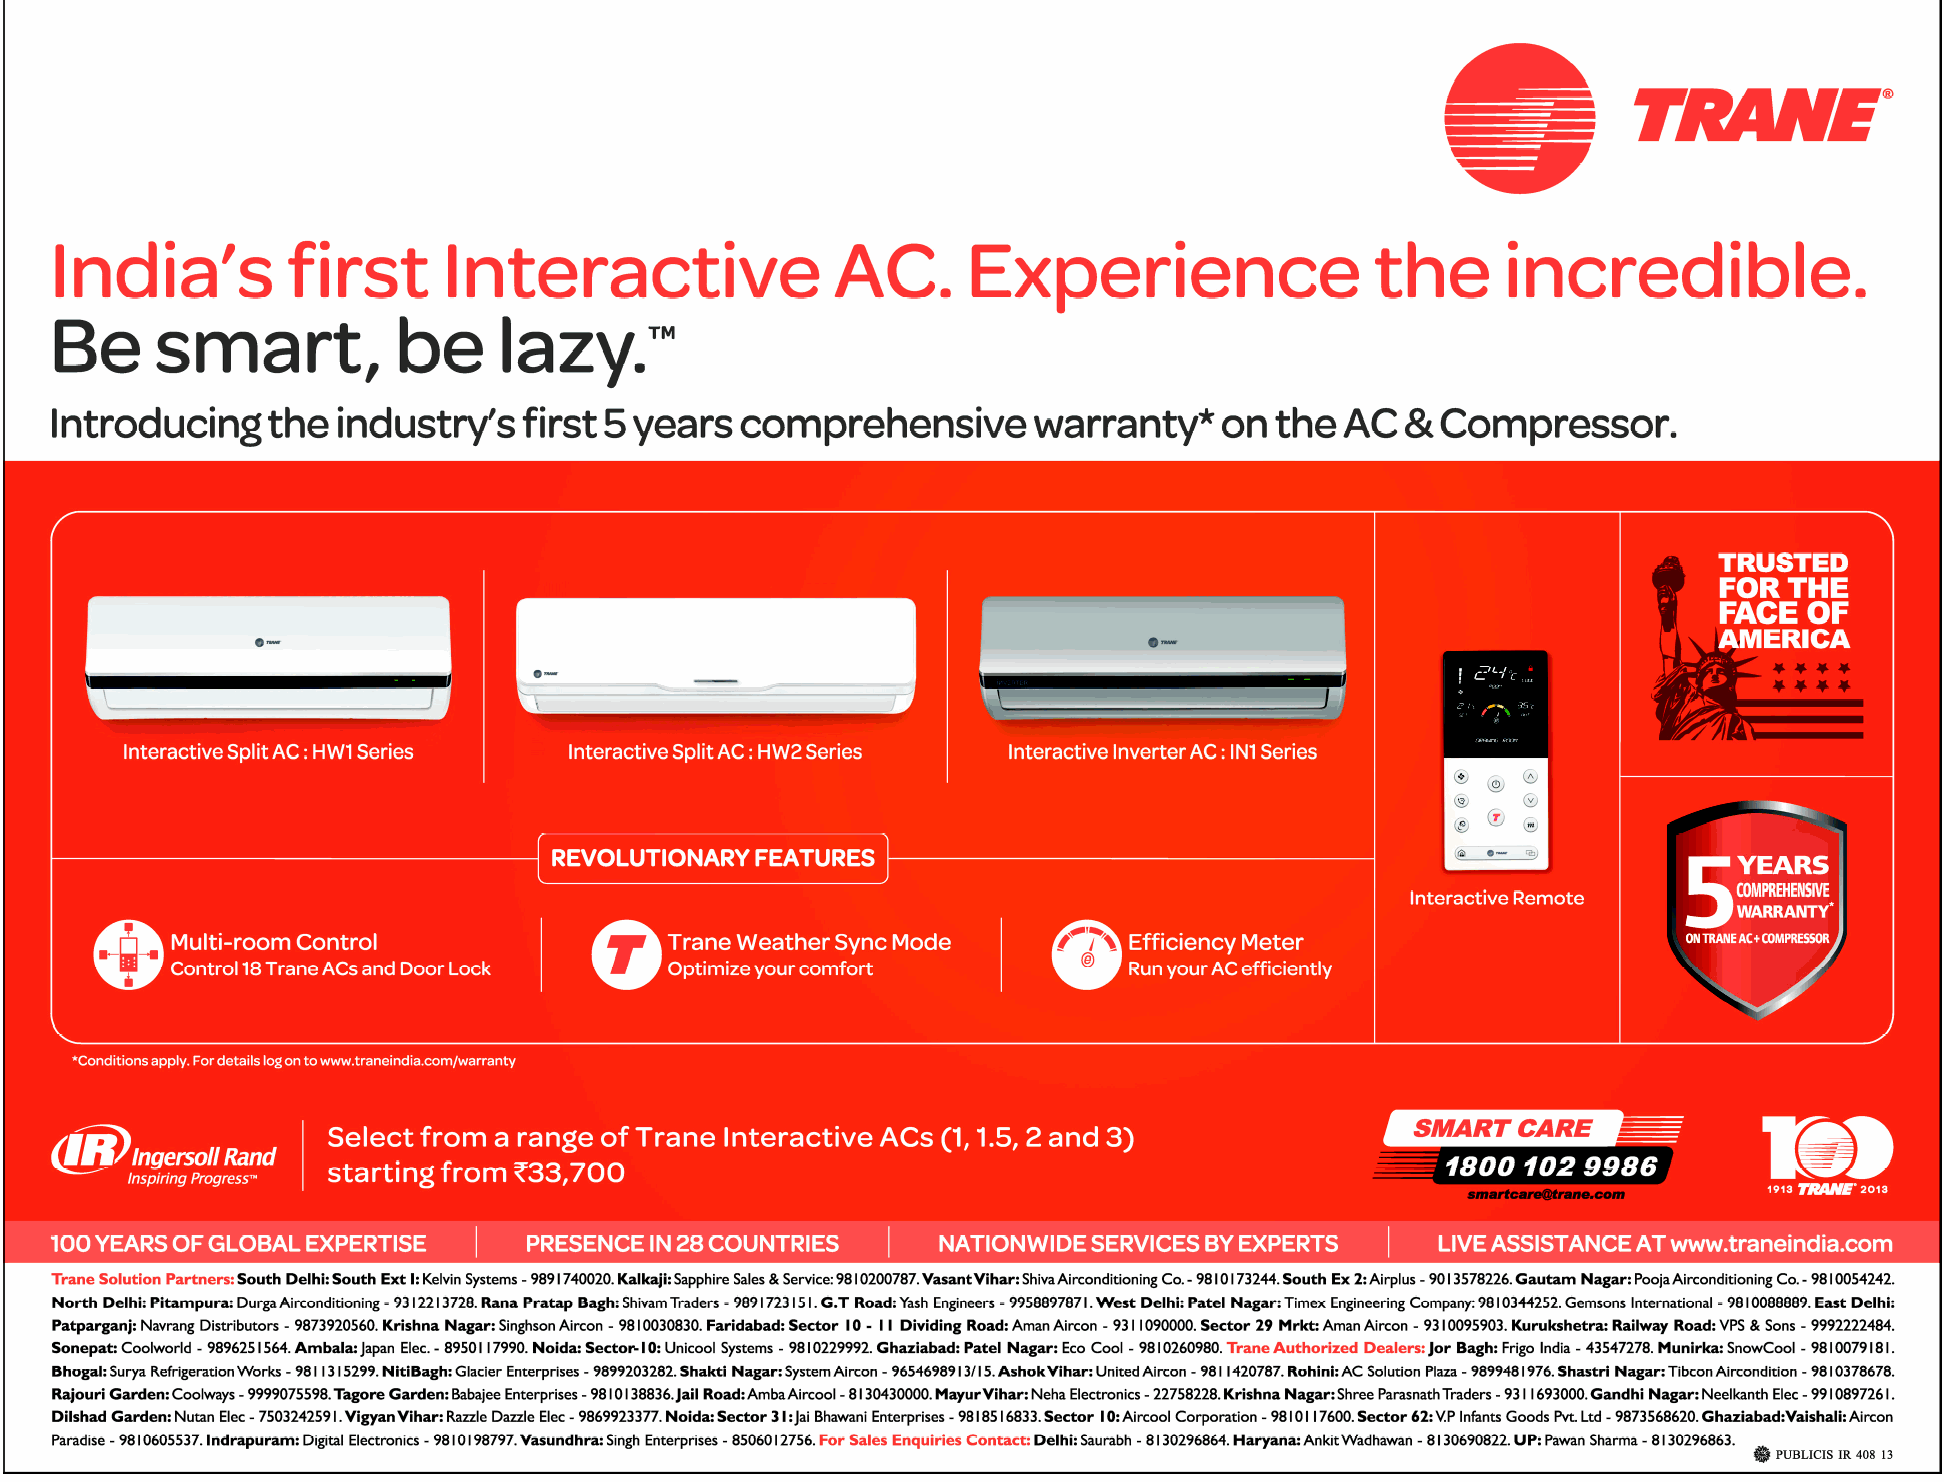 Trane Ac 5 Years Comprehensive Warranty New Delhi